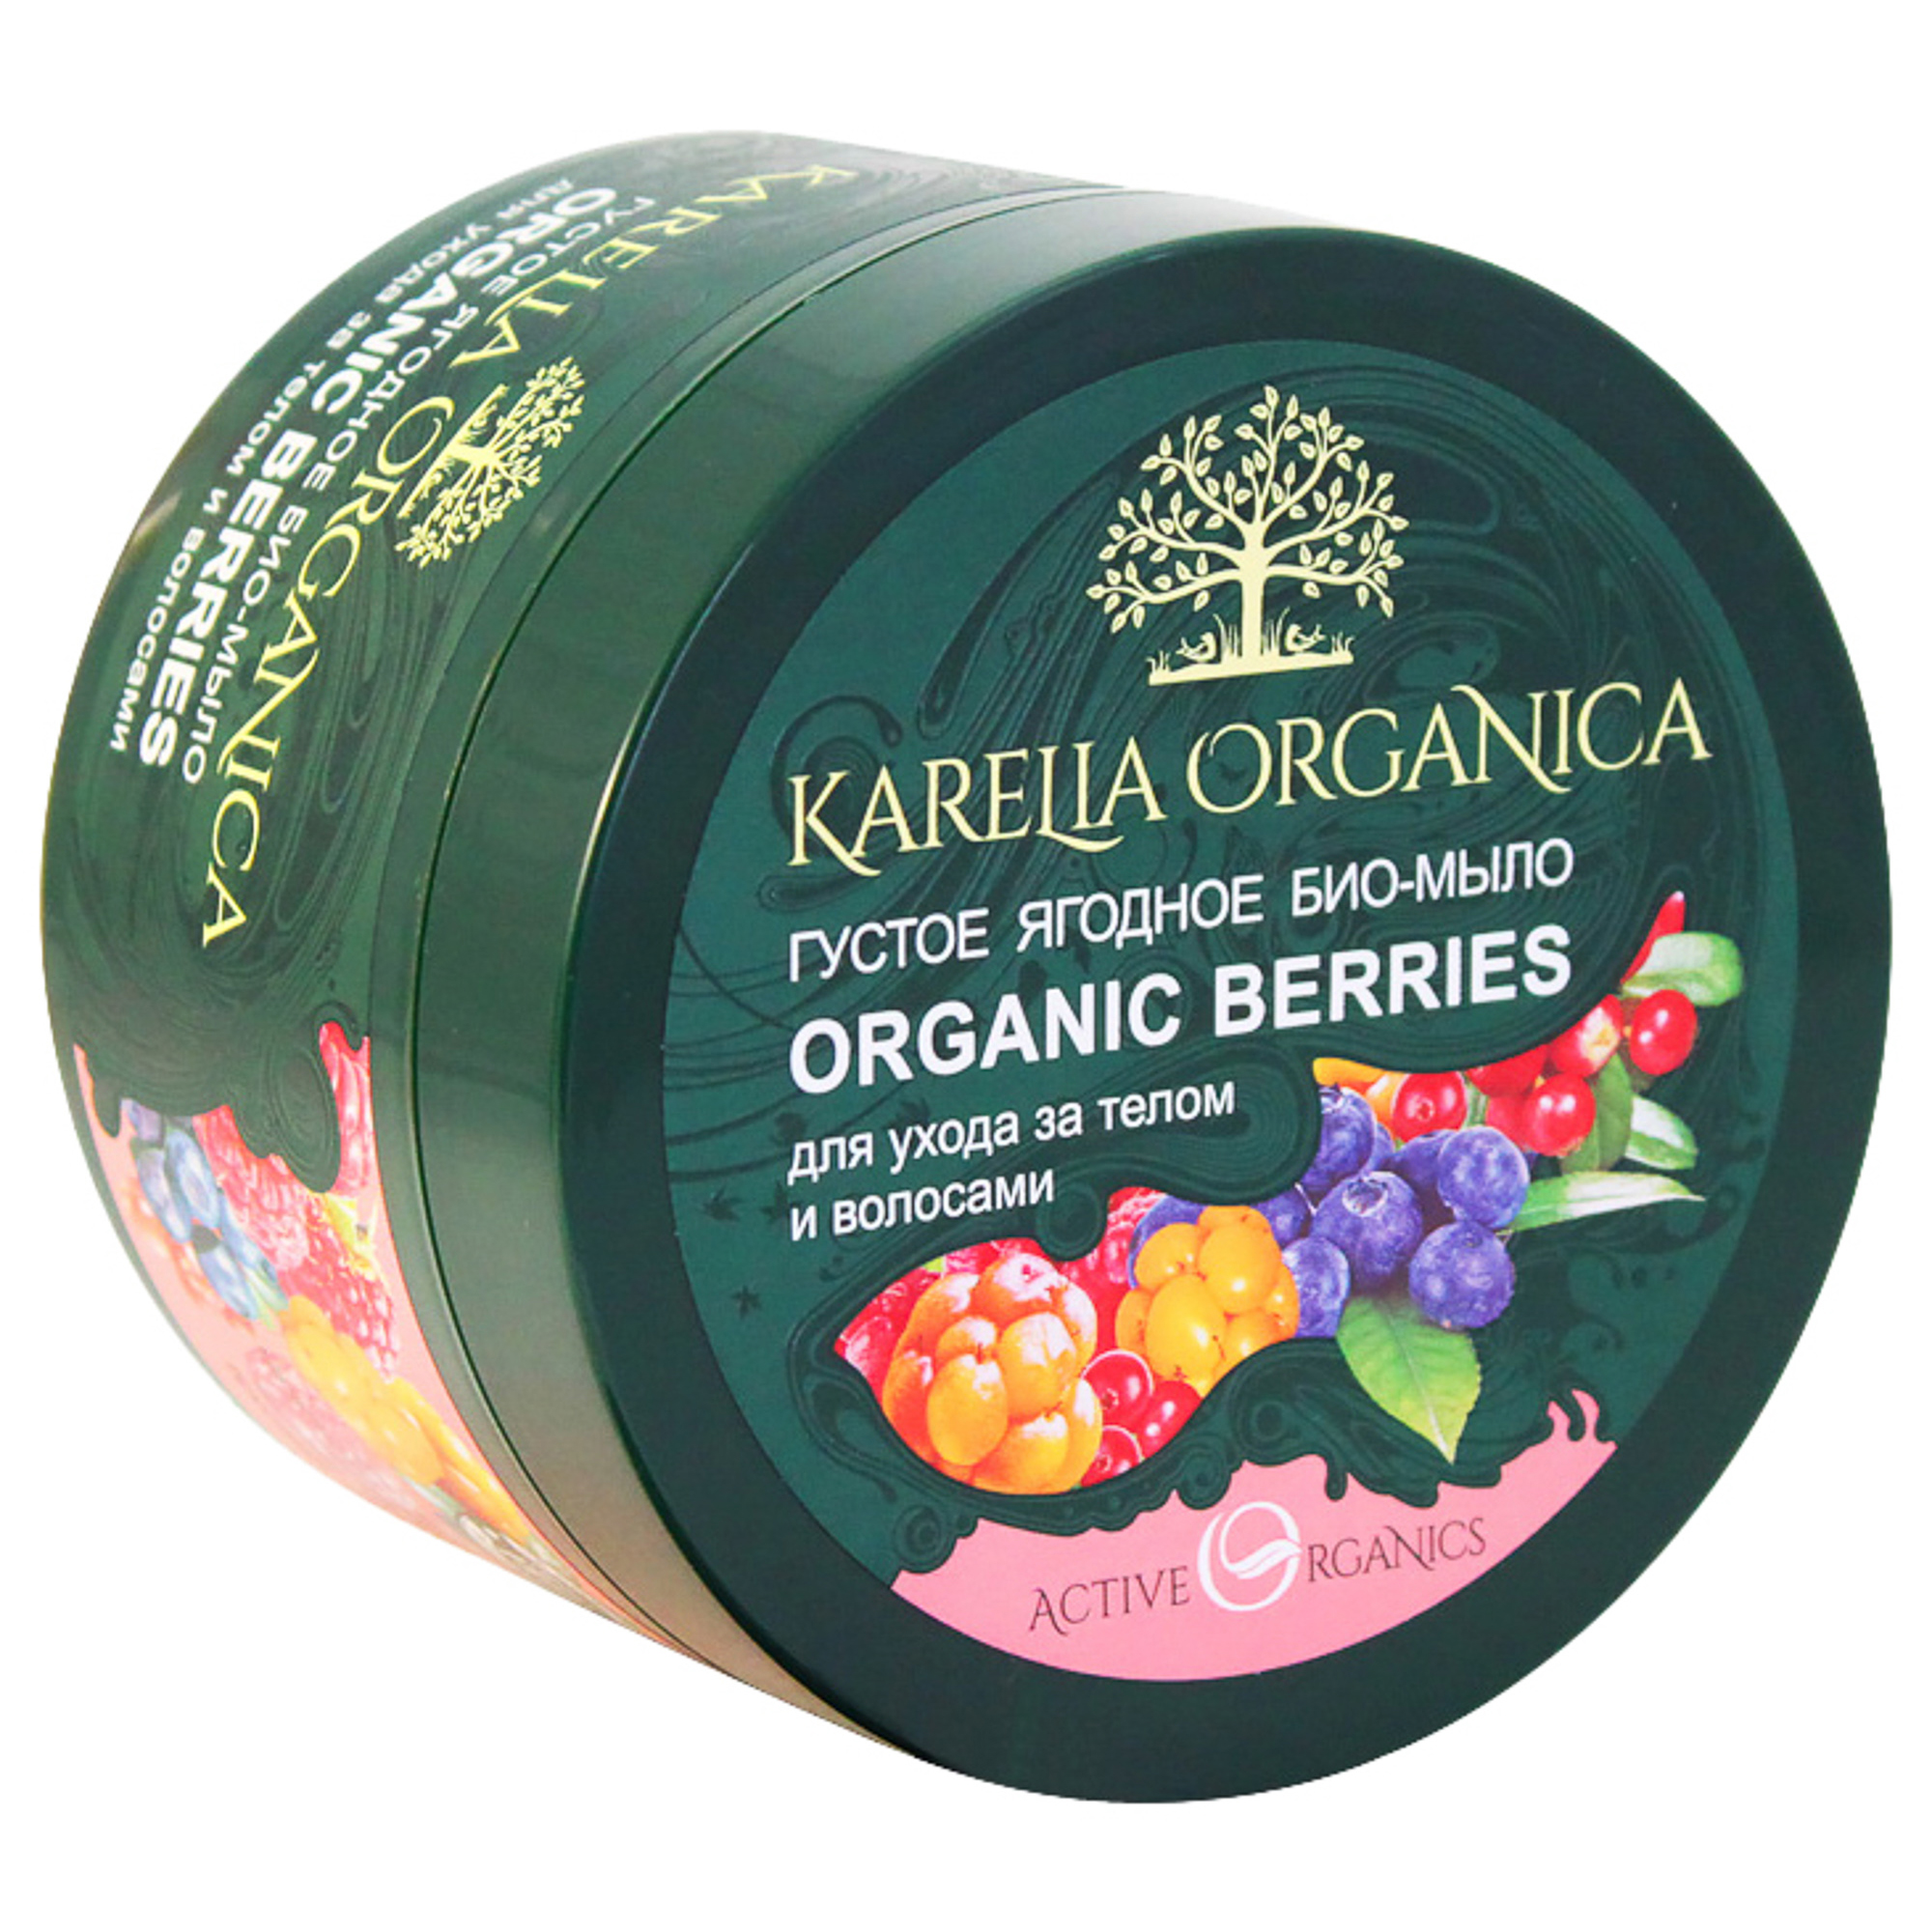 Мыло Фратти НВ Karelia Organica Organic Berries густое 500 г фото